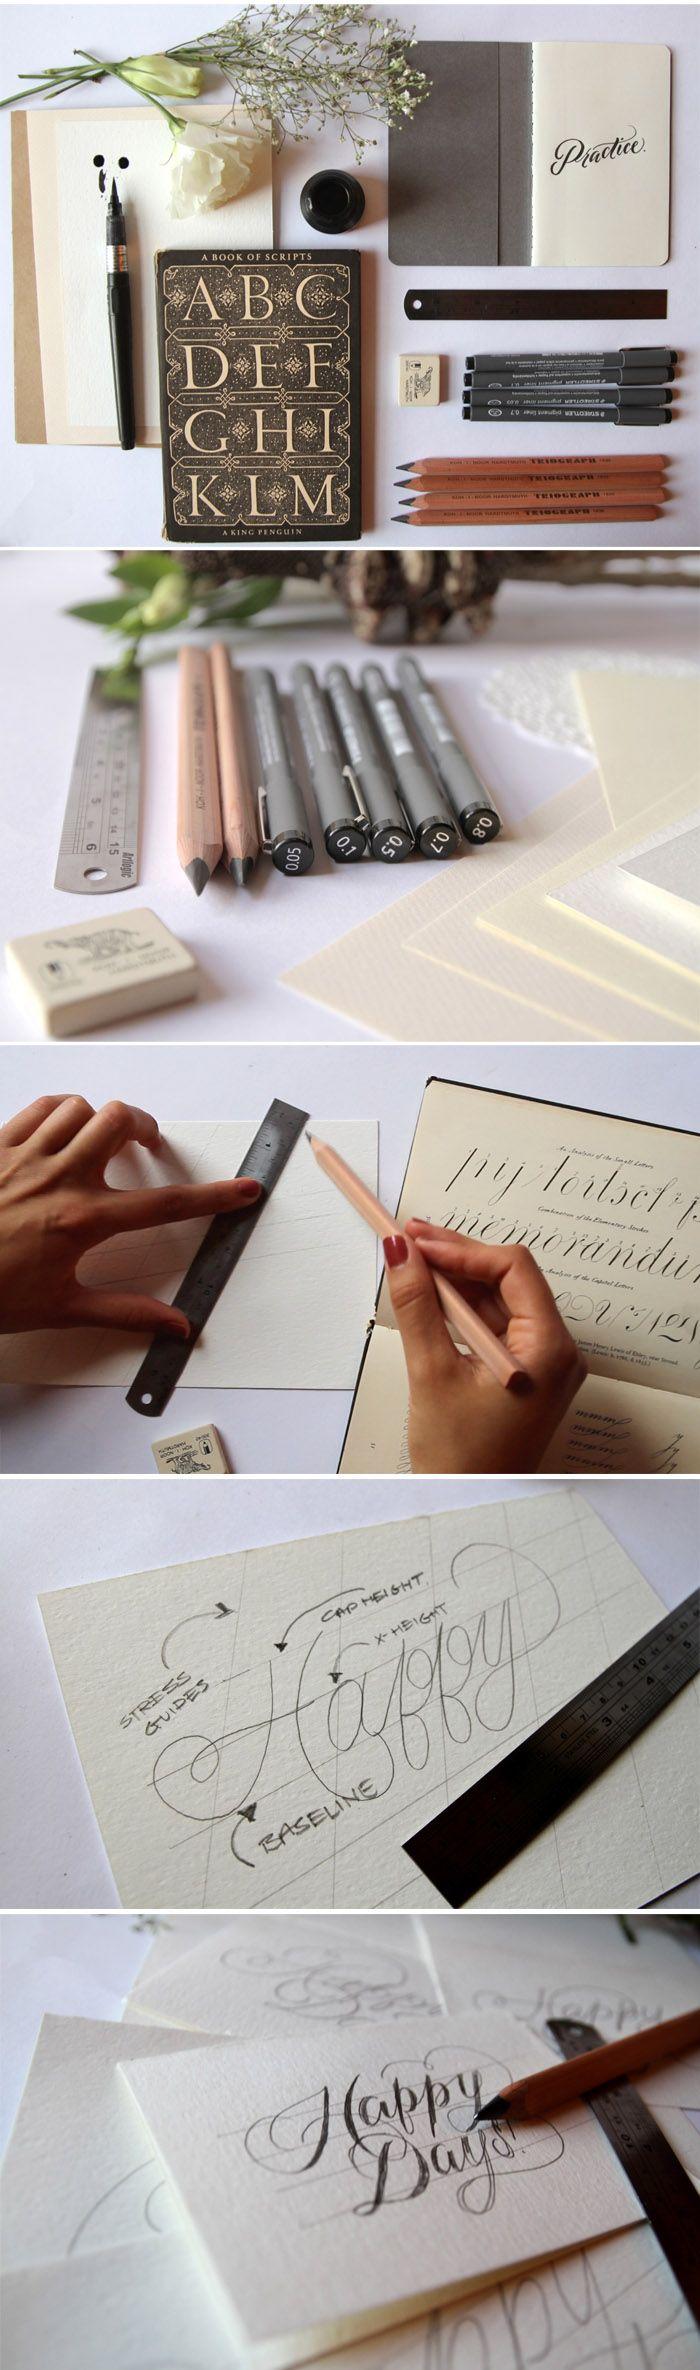 Diy Hand Lettering Typography Pinterest Lettering Tutorial